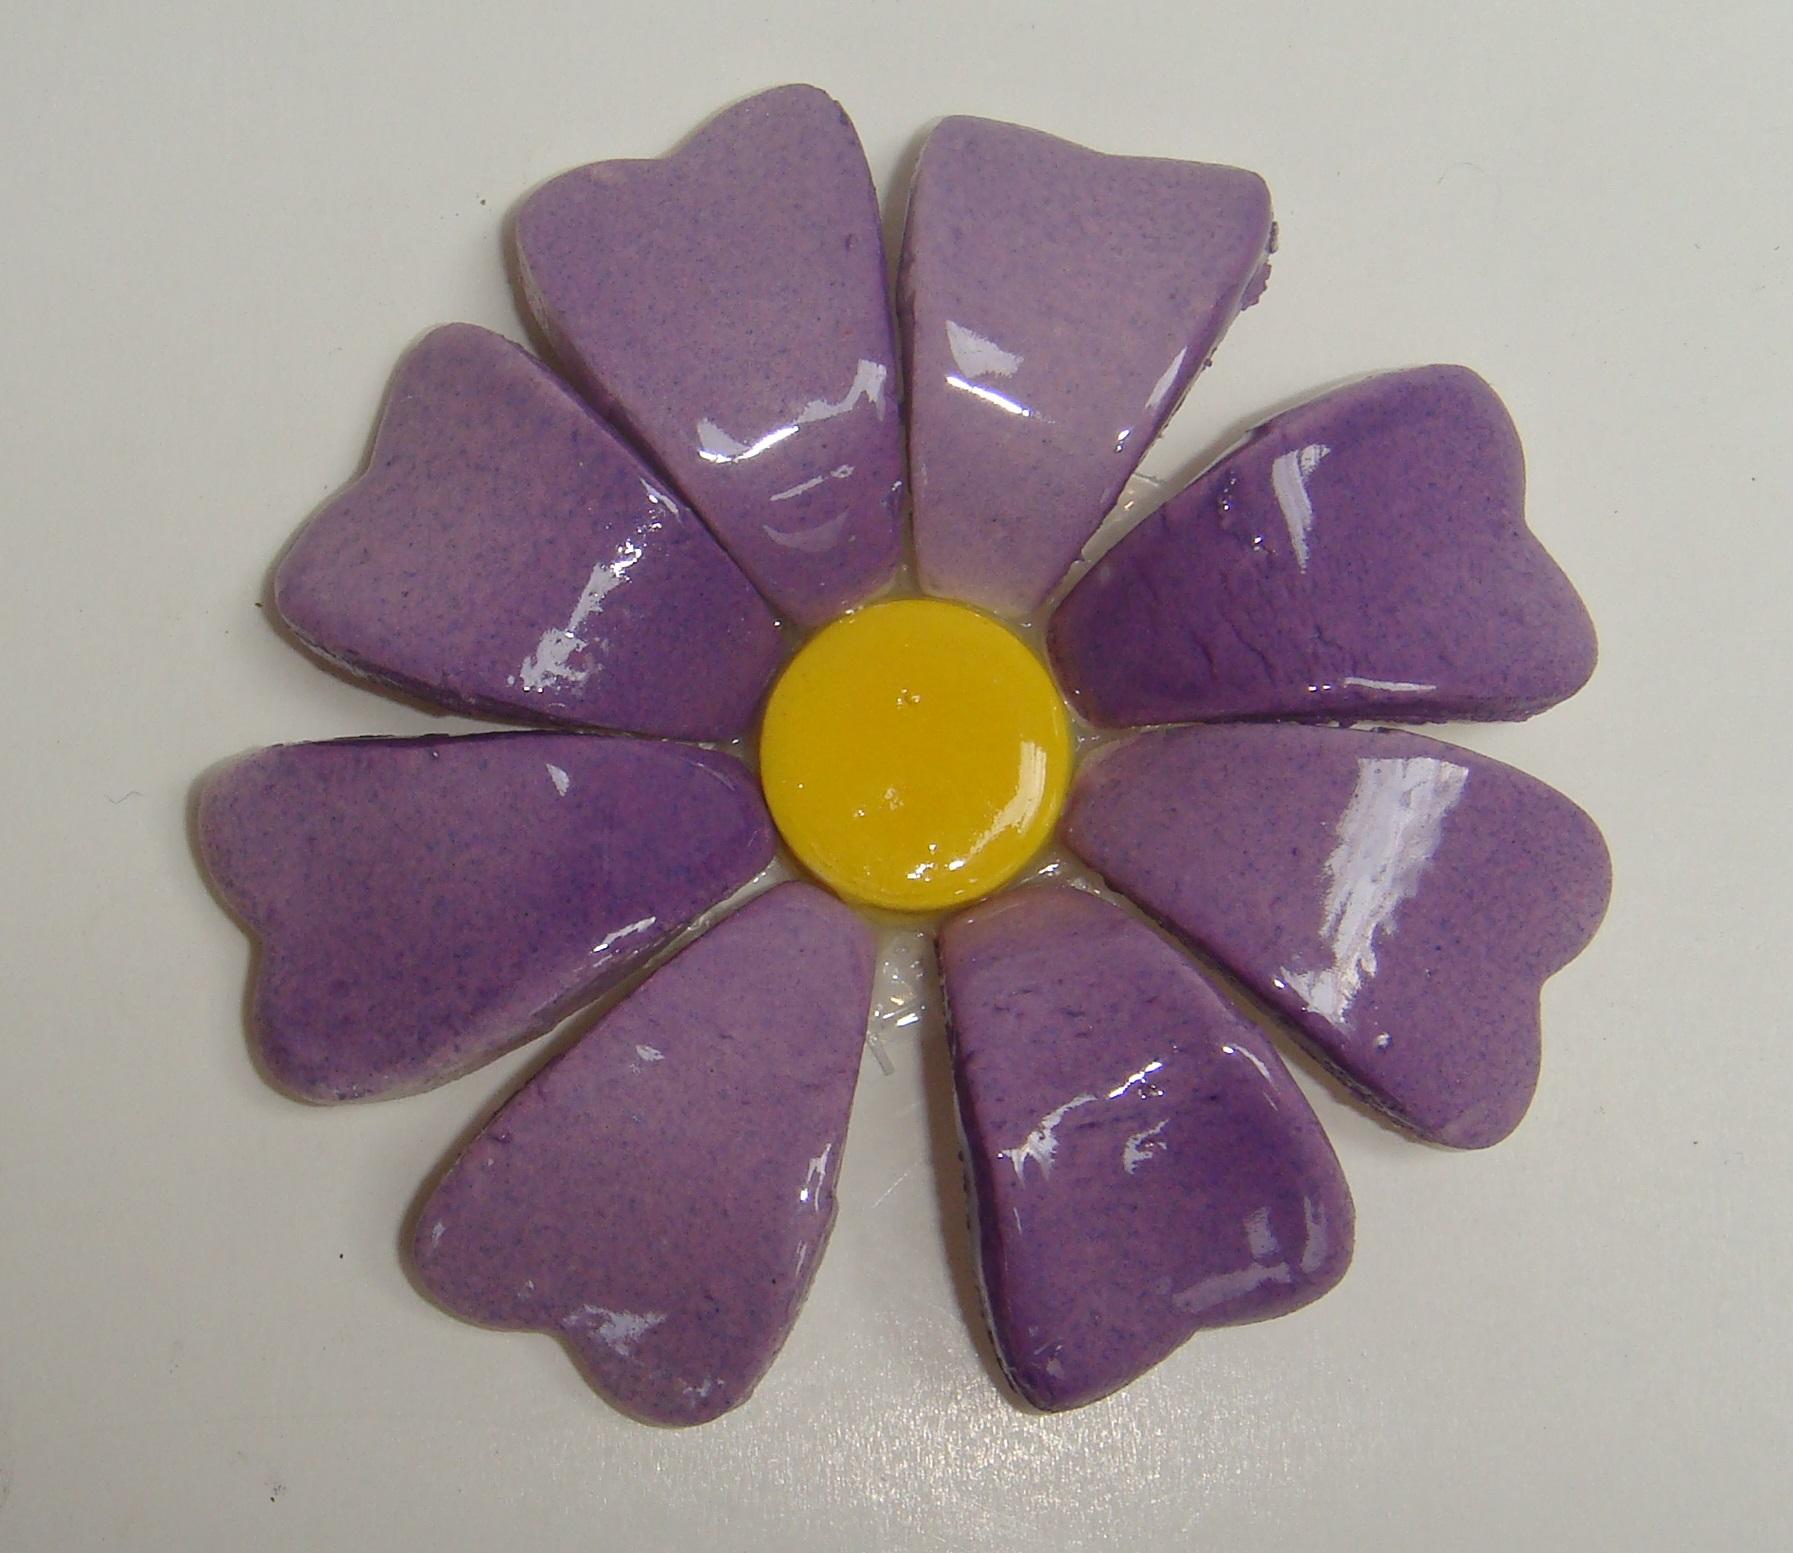 BLU-015 3D Flower Small Purple